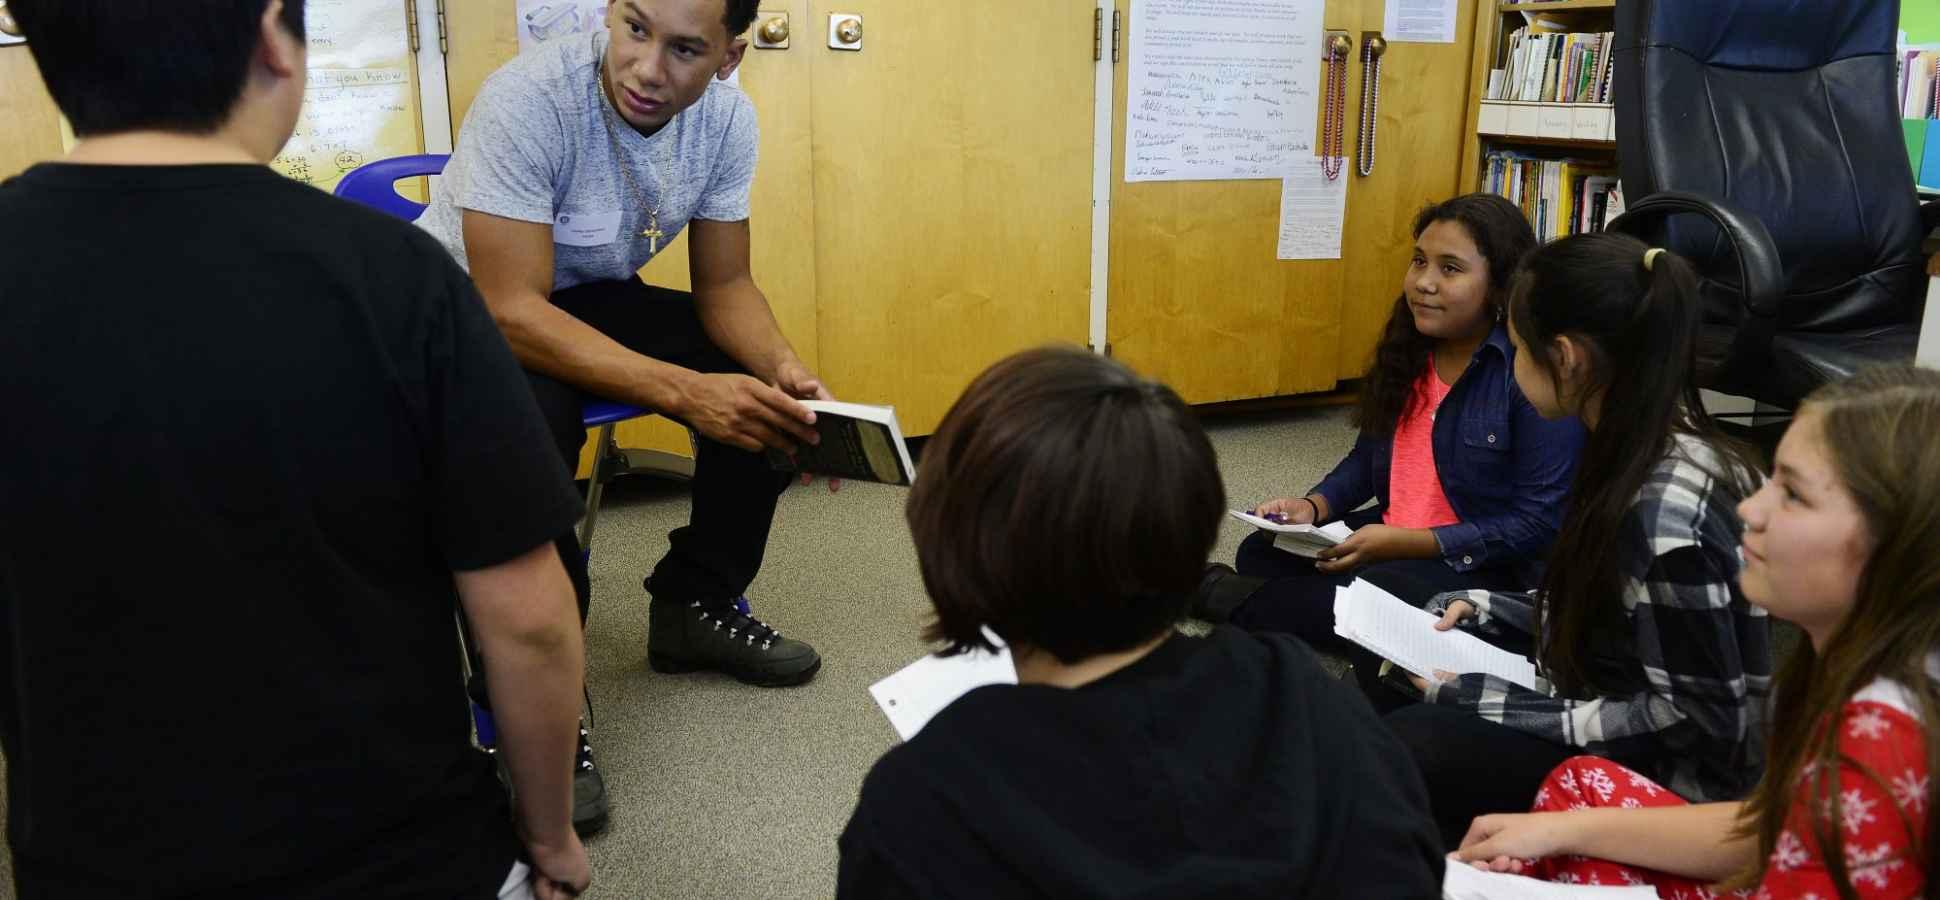 Meet Yup, the edtech startup that's rethinking tutoring